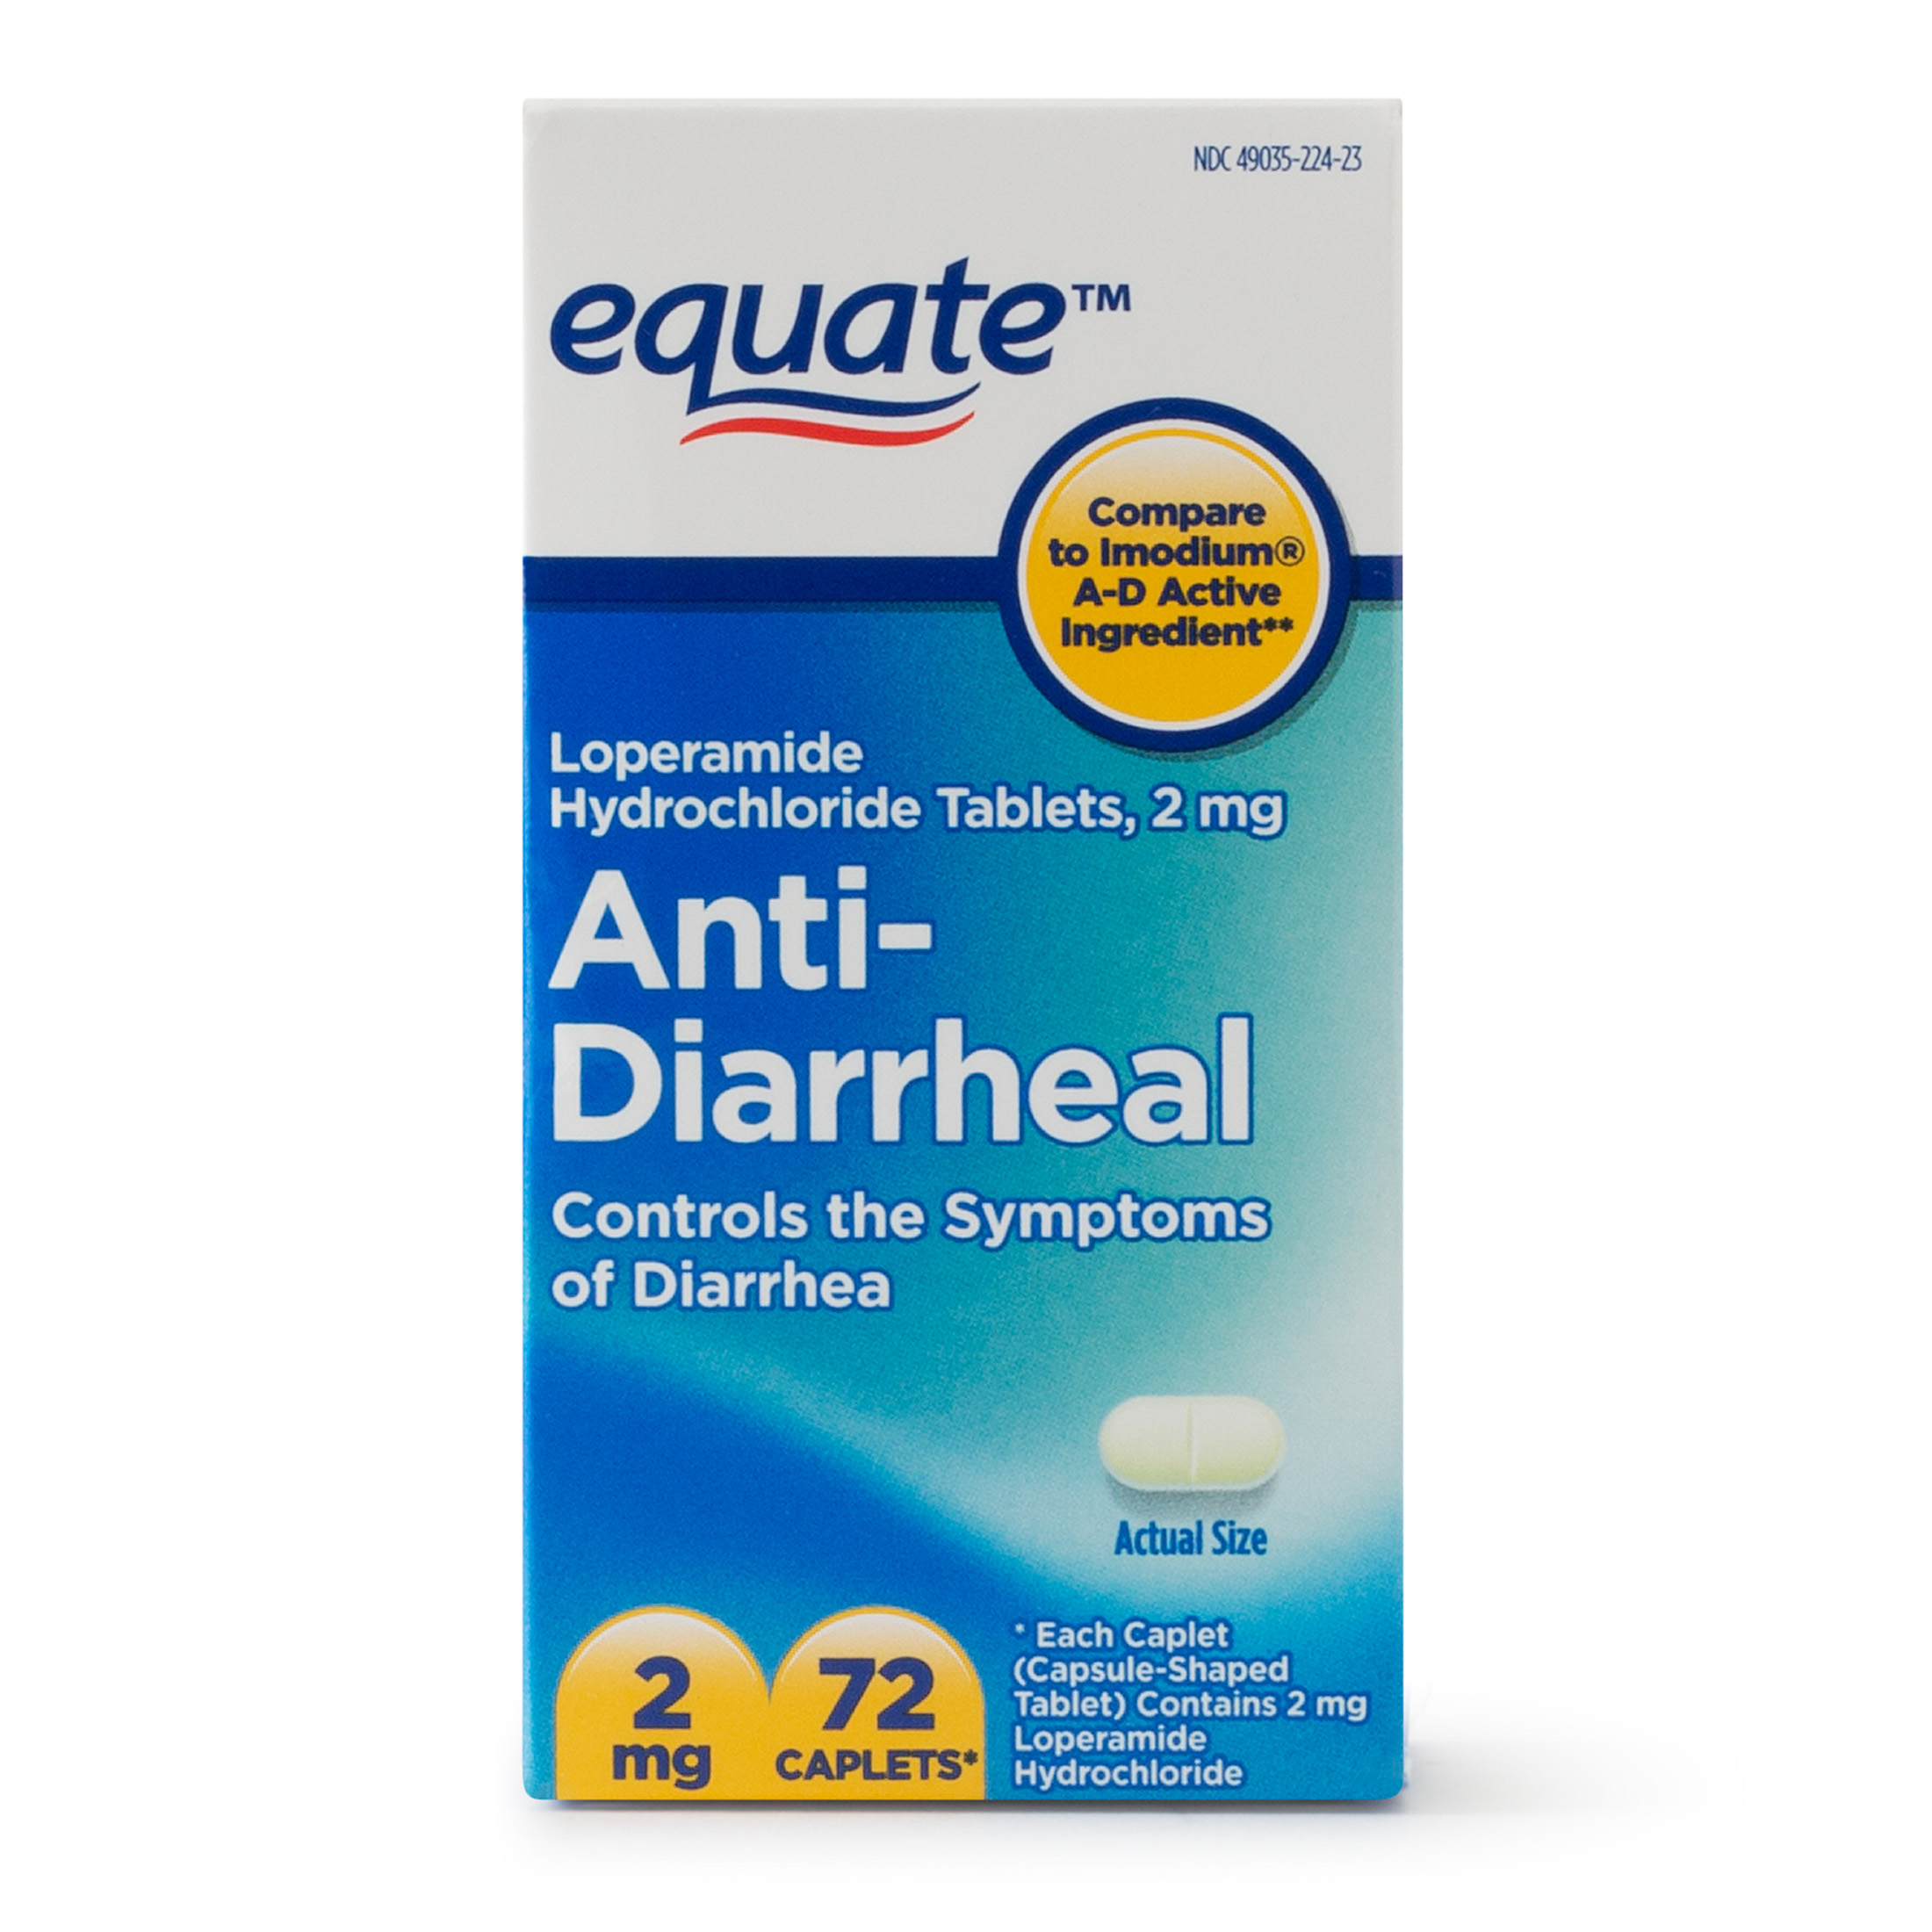 Equate Anti-Diarrheal Loperamide Hydrochloride Caplets, 2 mg, 72 Ct